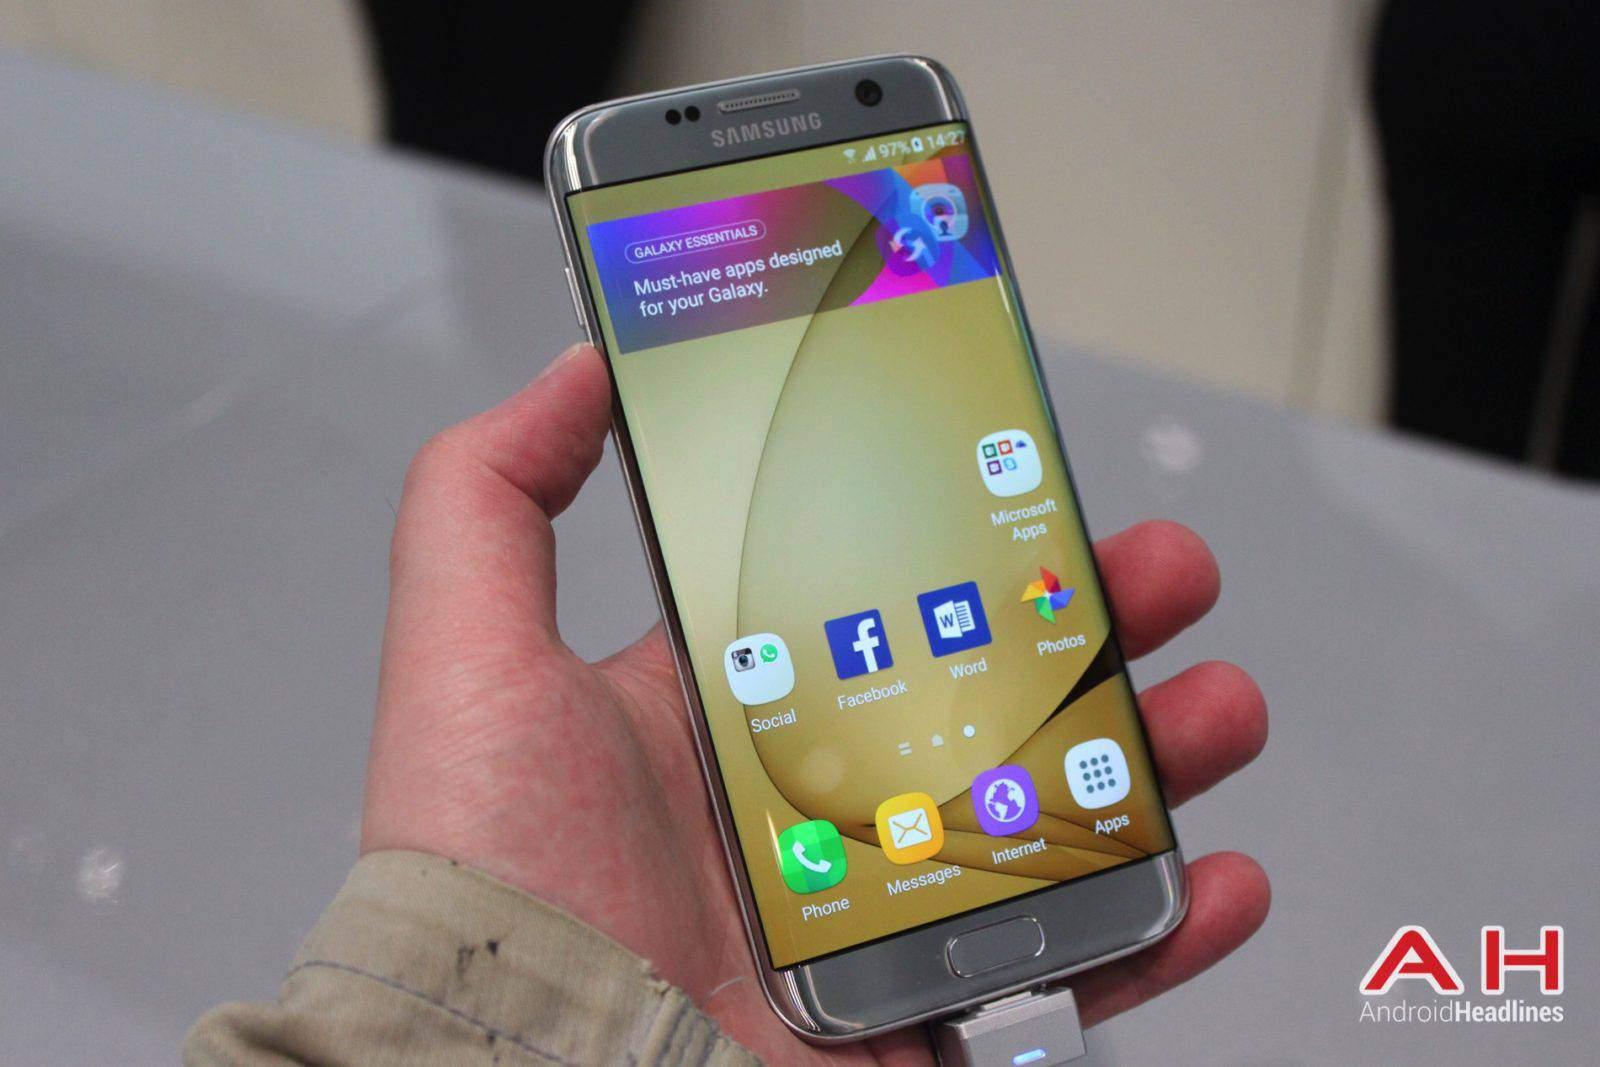 Galaxy S7 Edge MWC Booth AH 12